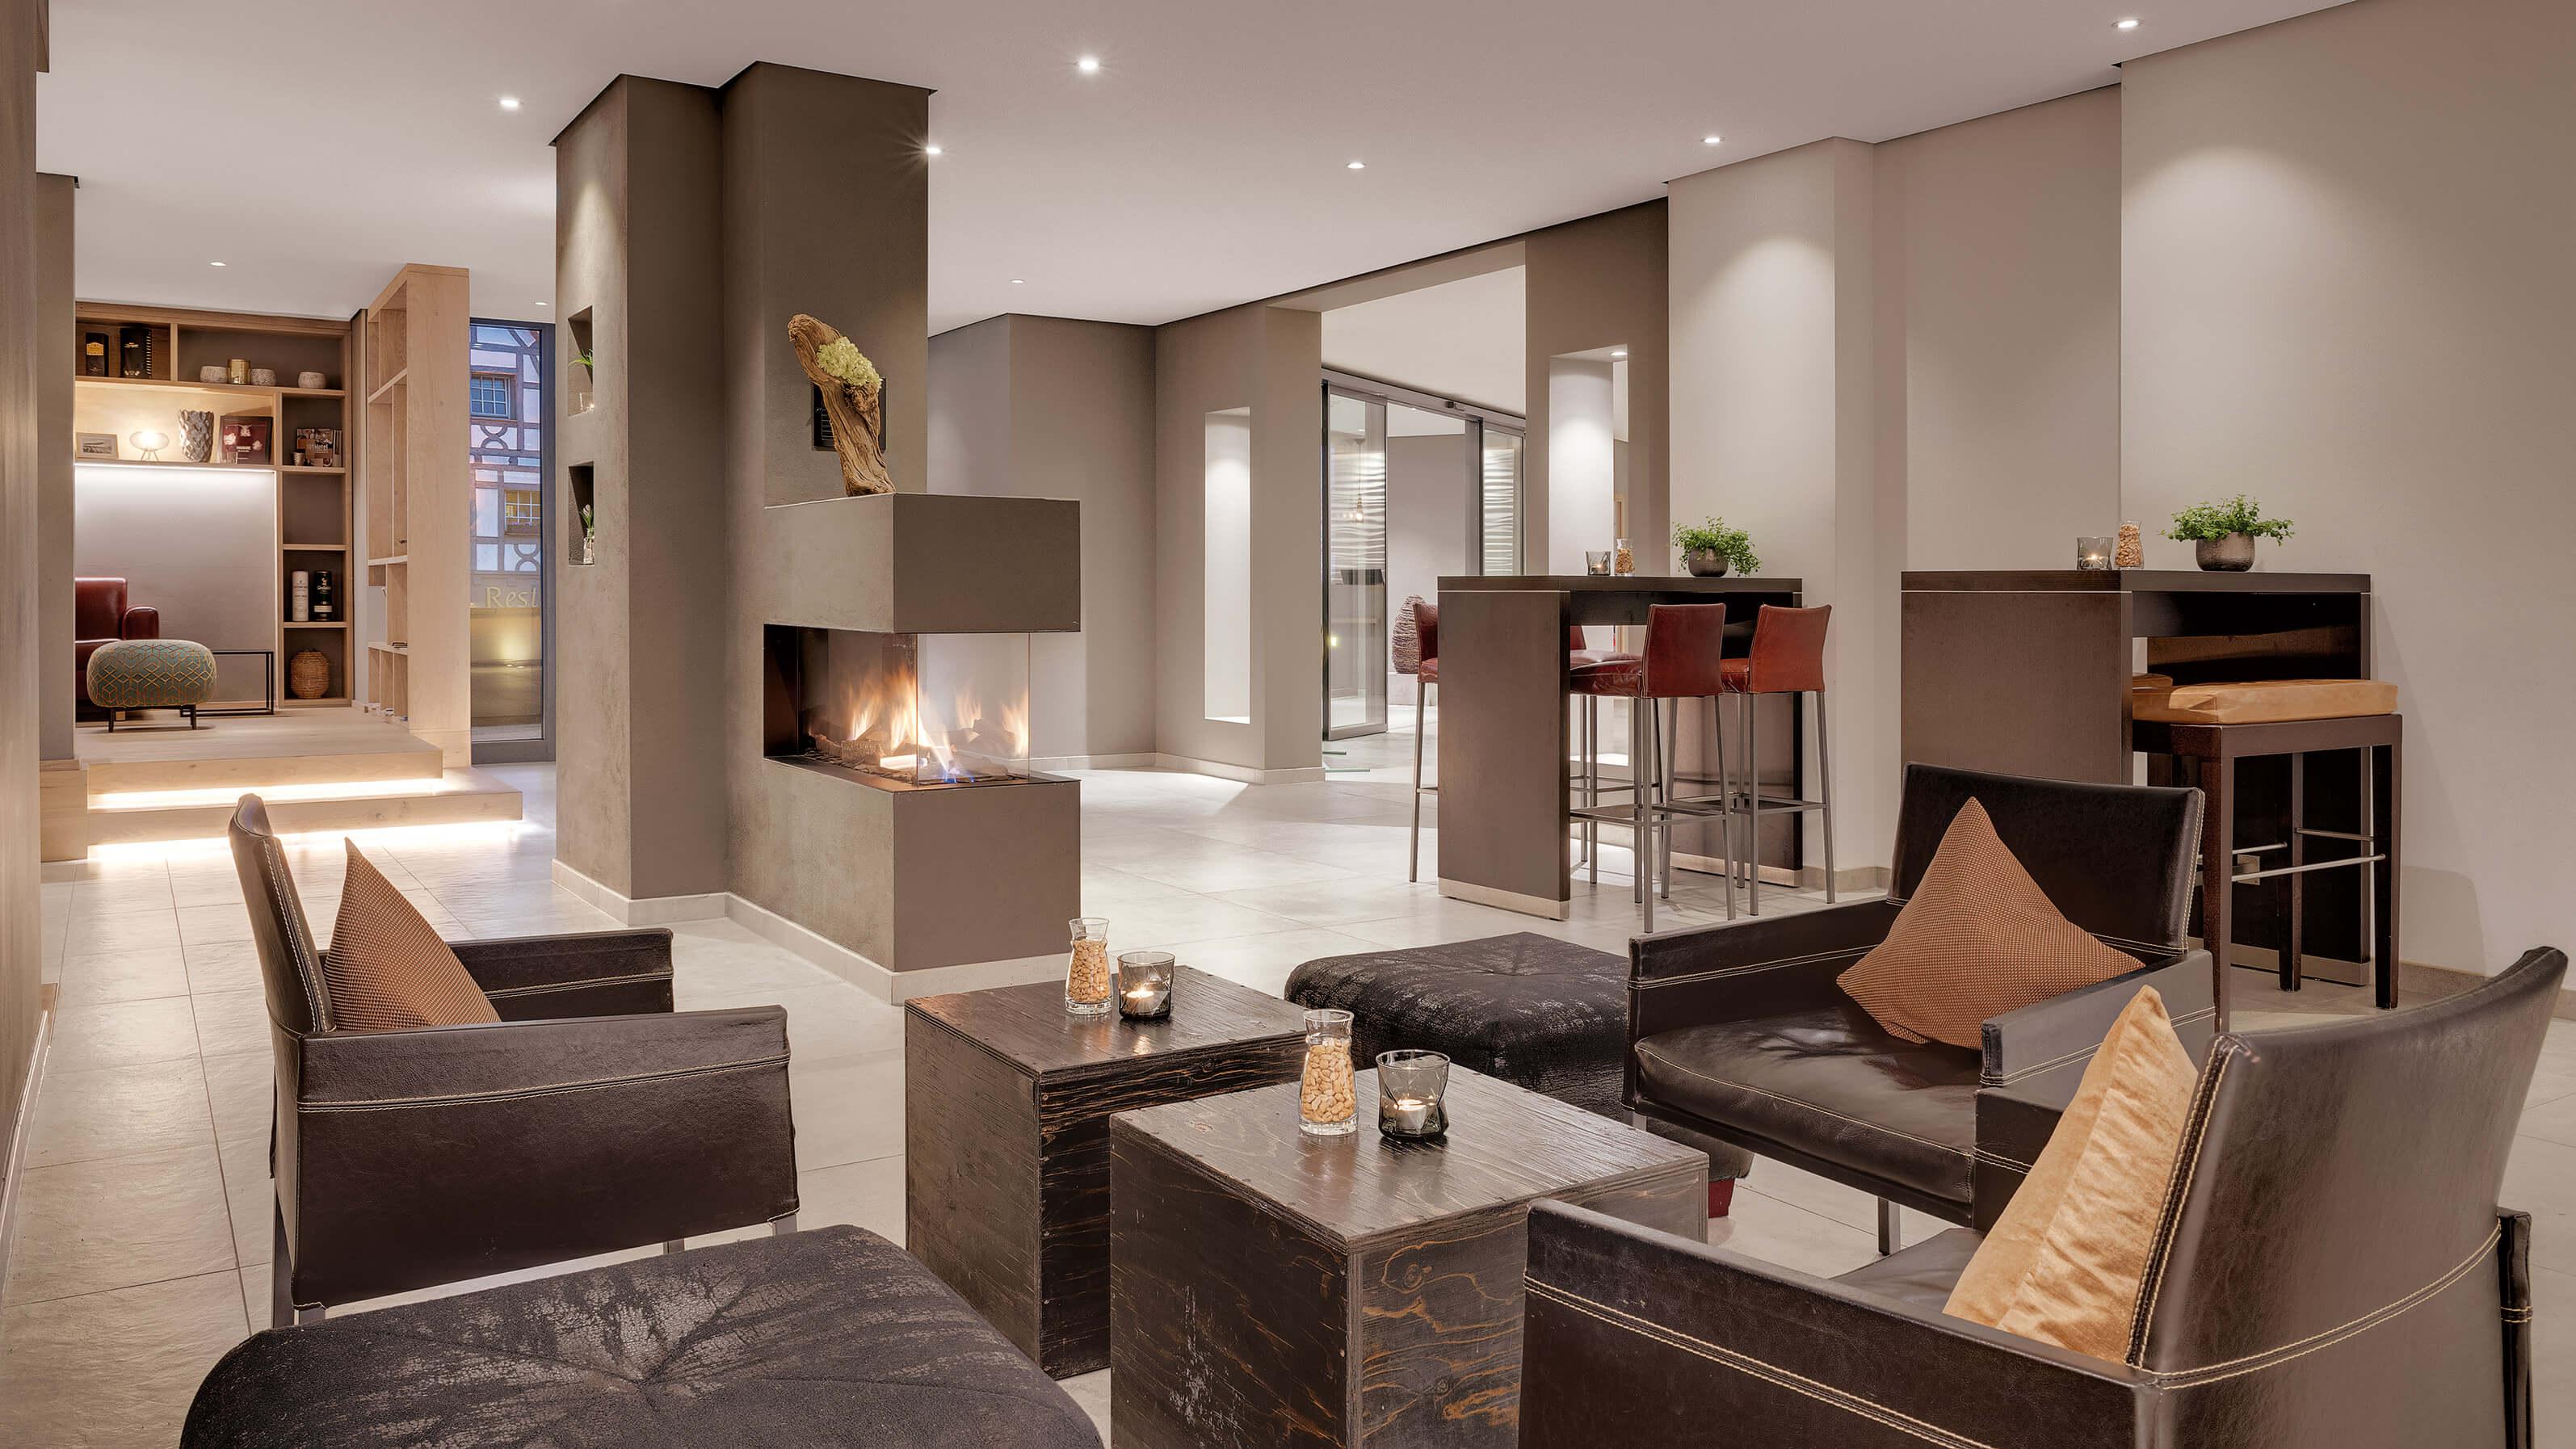 hotelausstattung-hoteleinrichtungen-bachhuber-Traube-am-See2